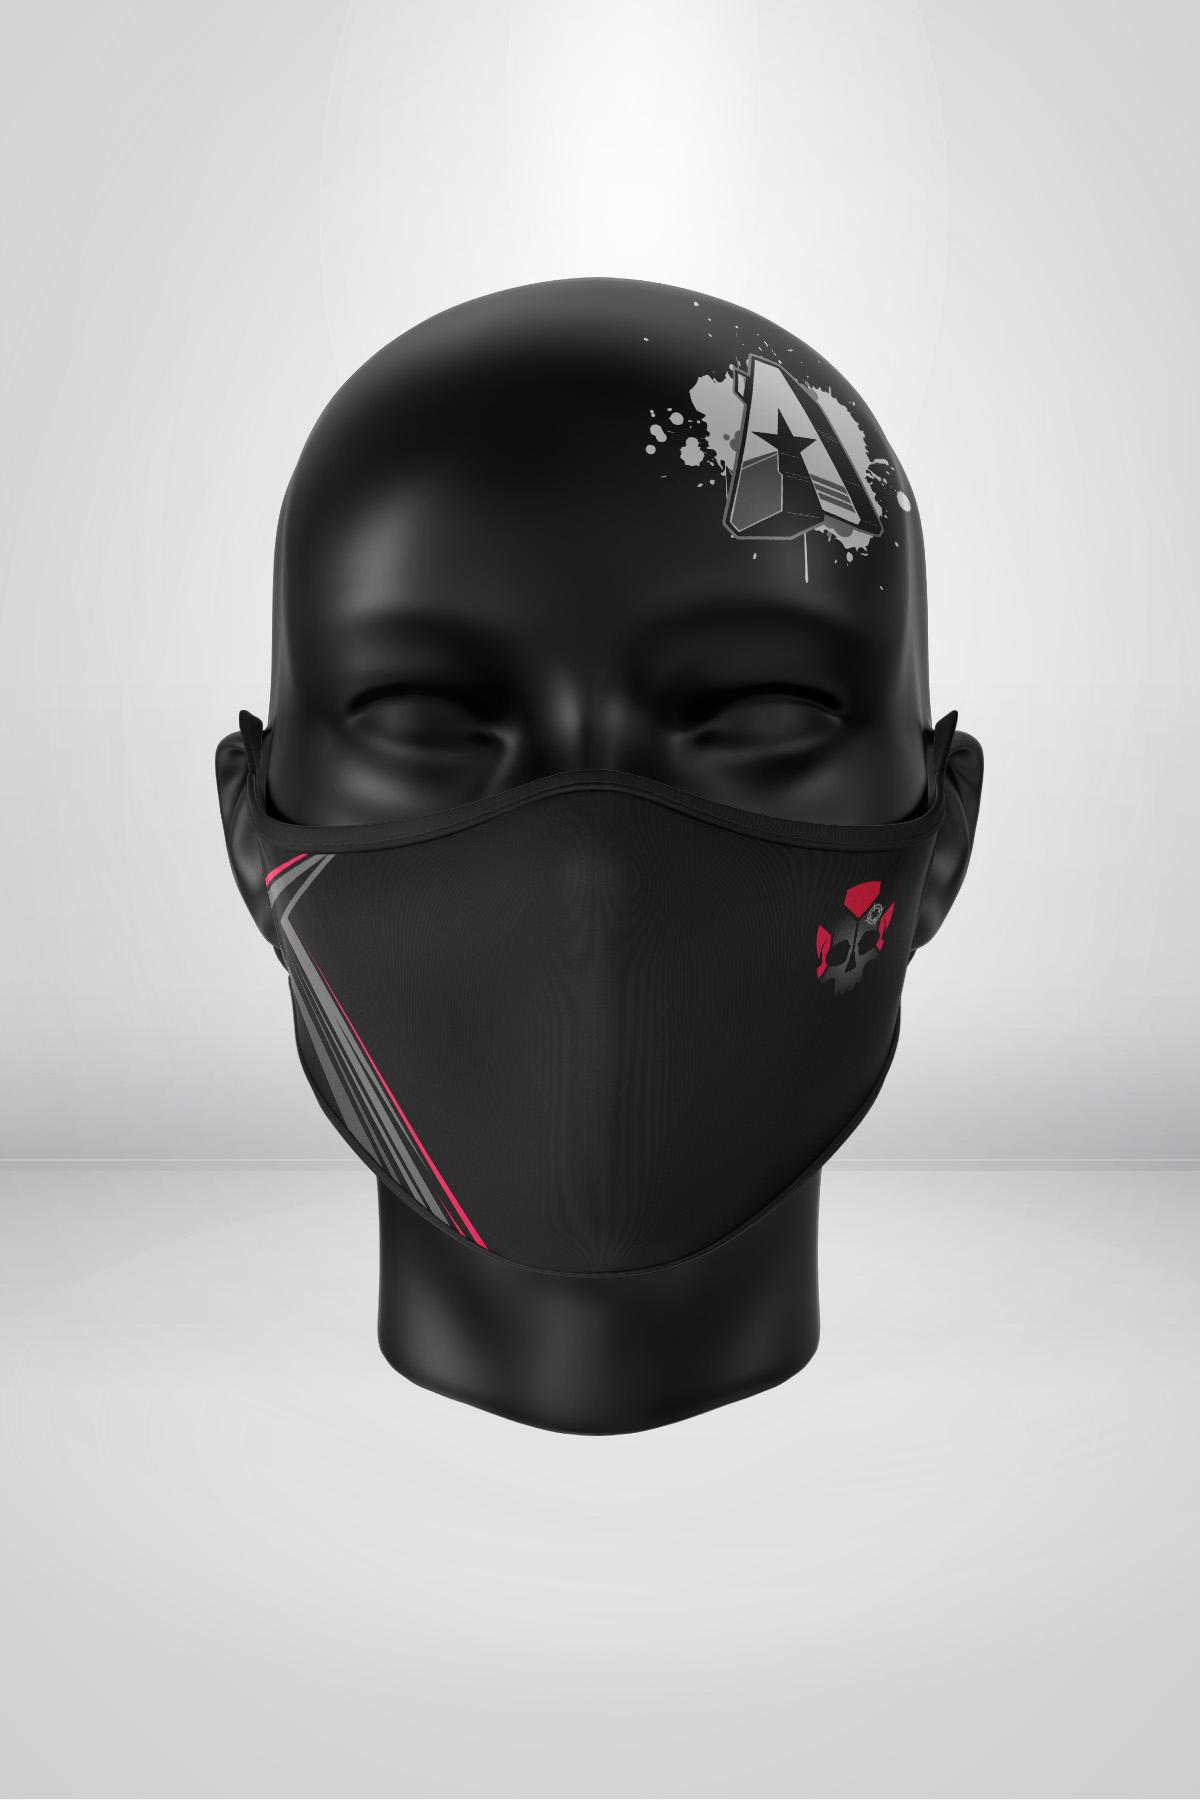 swatnationmask